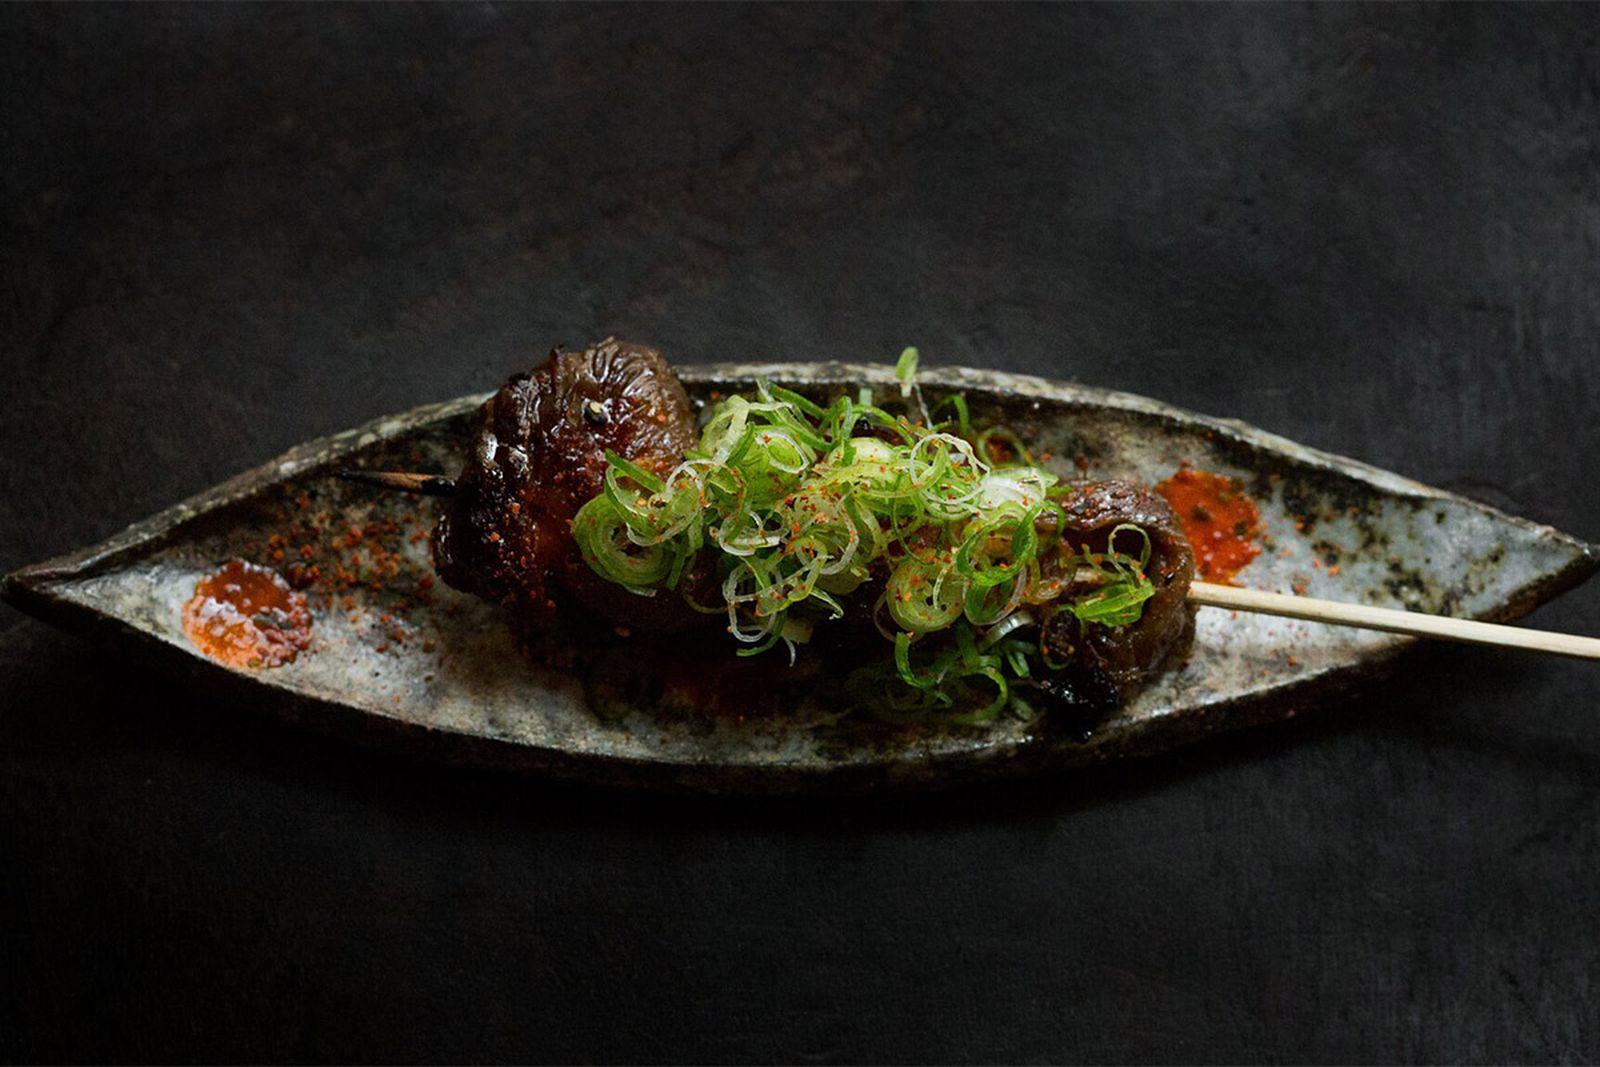 nyc mid range restaurants testu AMEX american express platinum food & drink